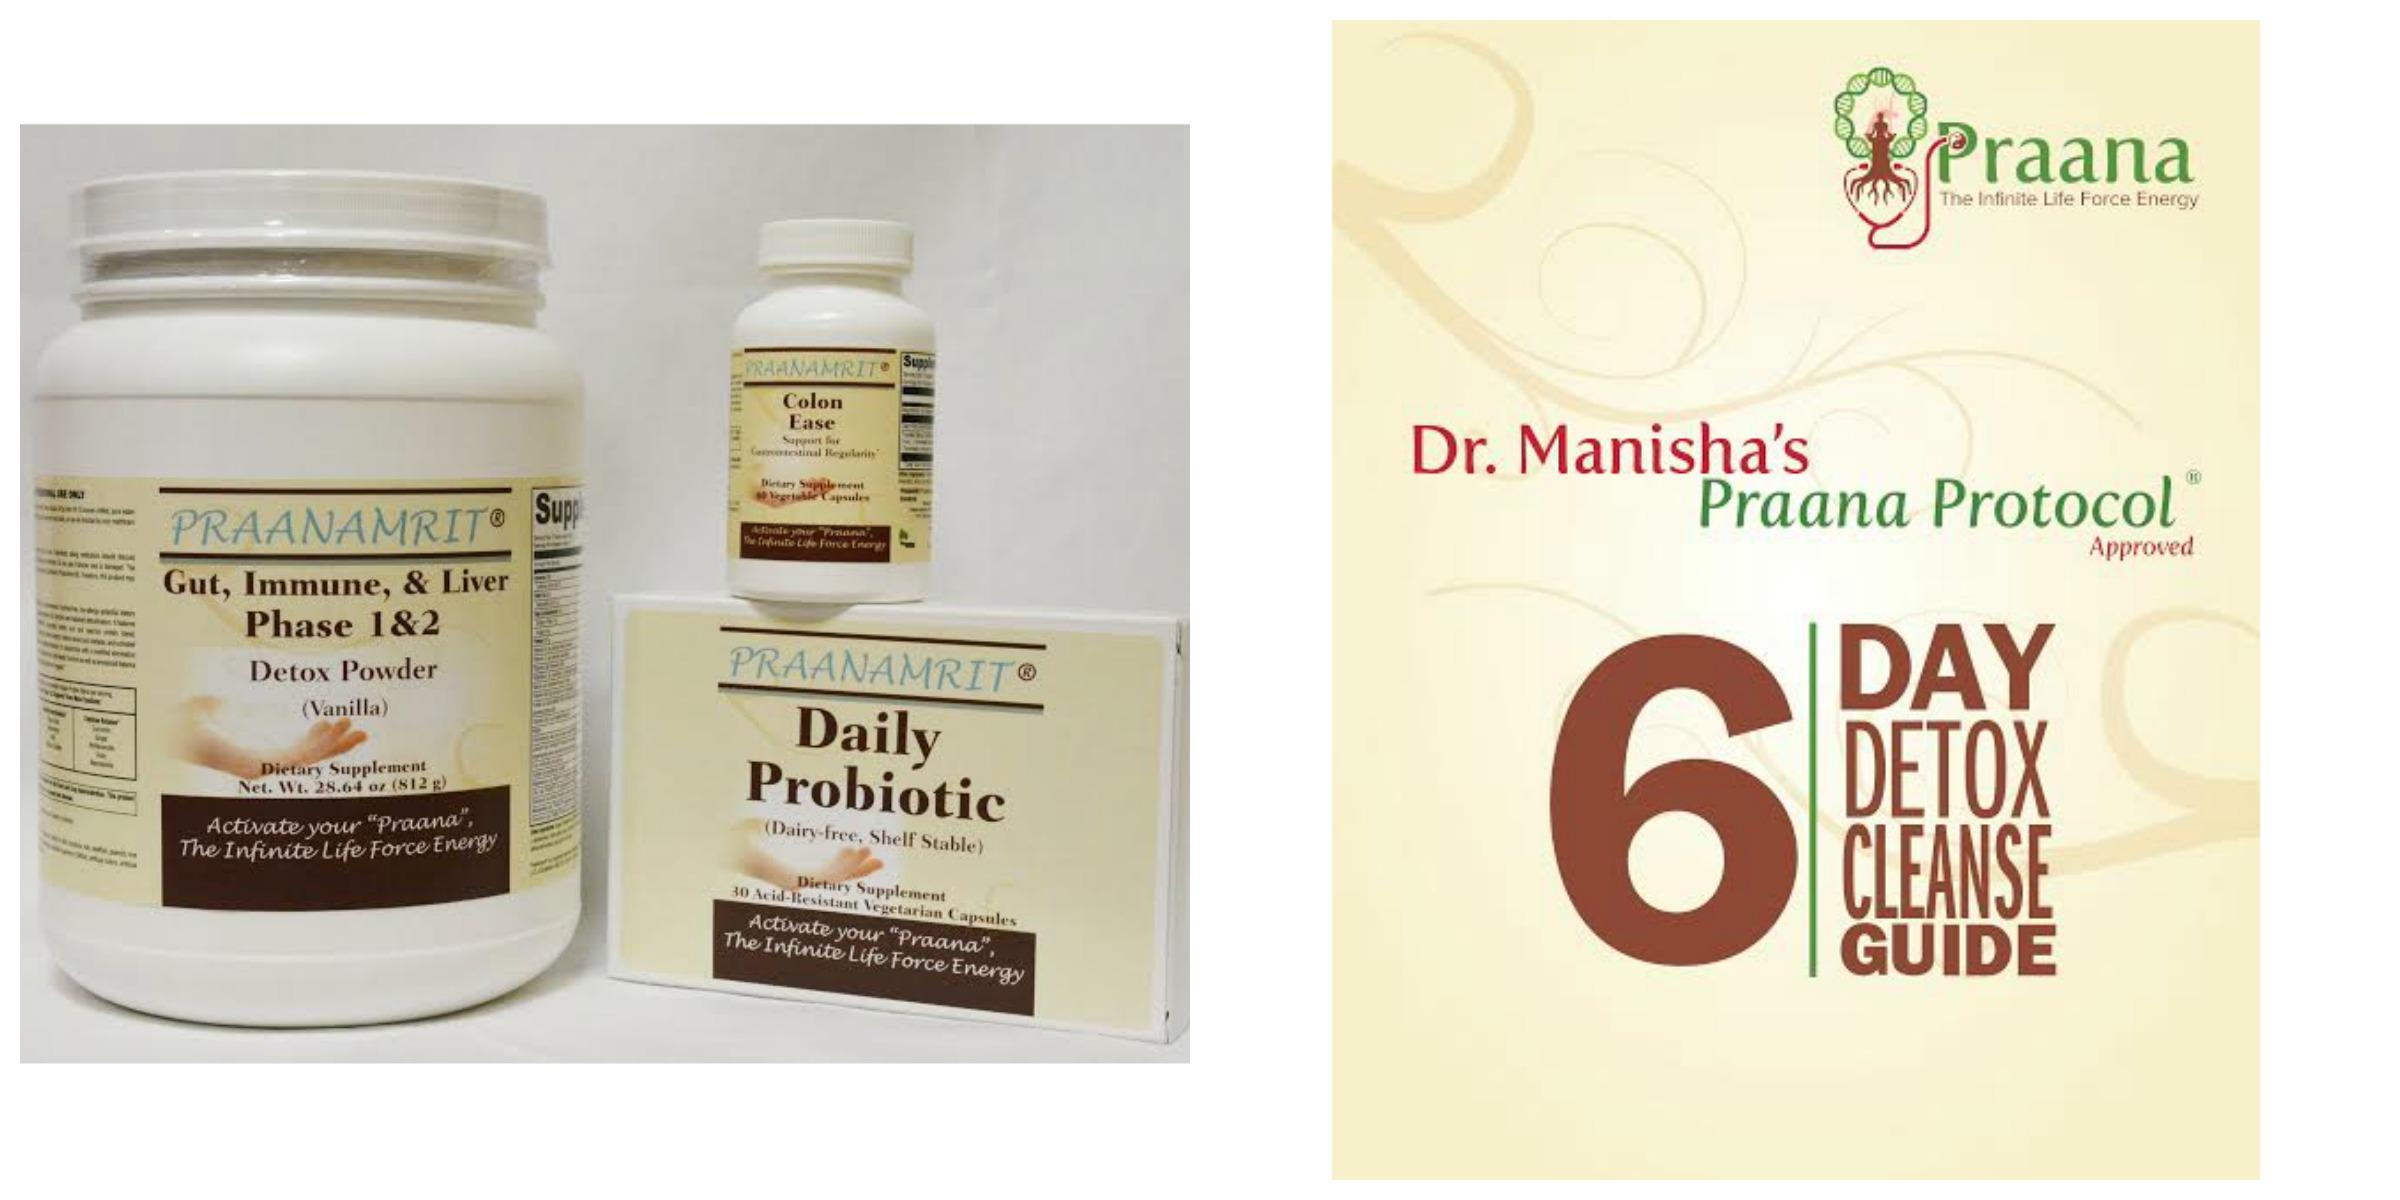 Dr  Manisha's Praana Protocol® approved 6 day Detox Cleanse Kit 1